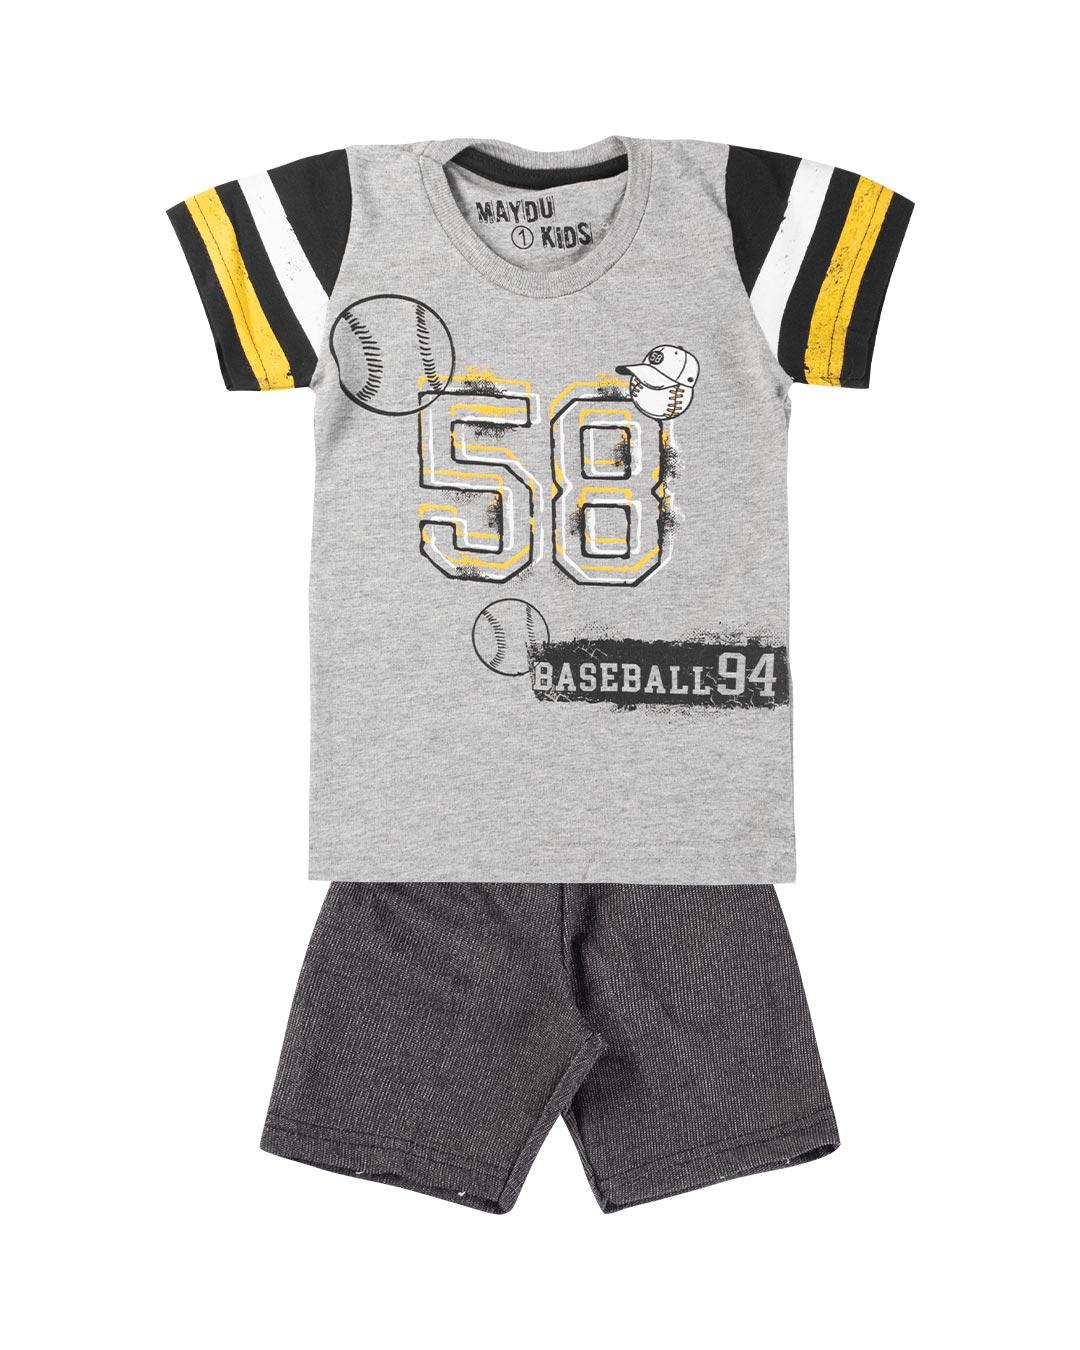 Conjunto Infantil Baseball 94 - Maydu Kids